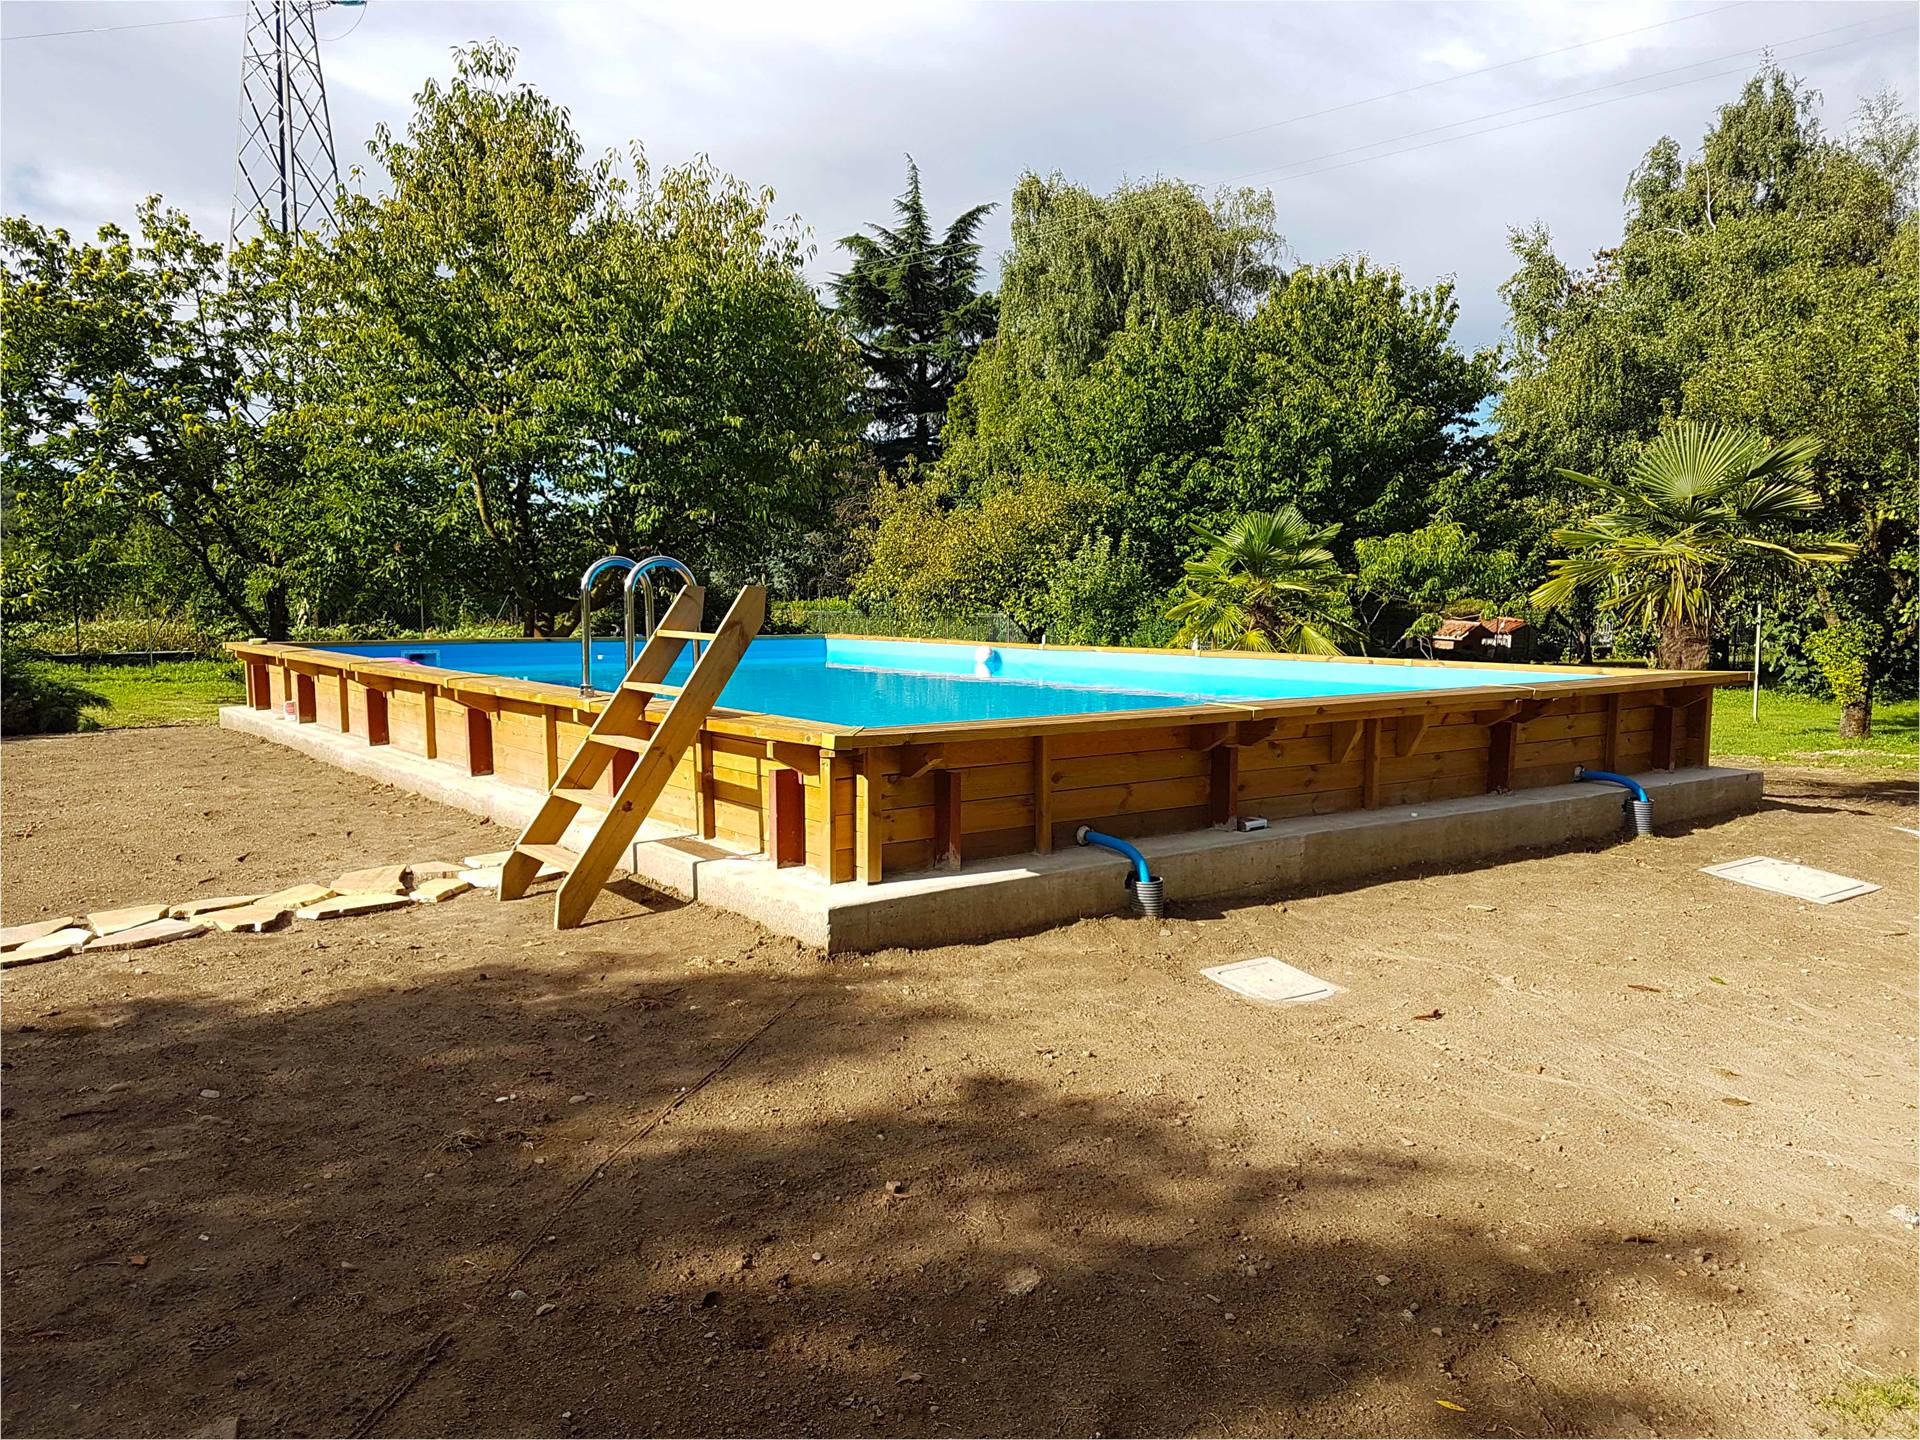 piscine en bois hors sol rectangulaire niagara 6x4